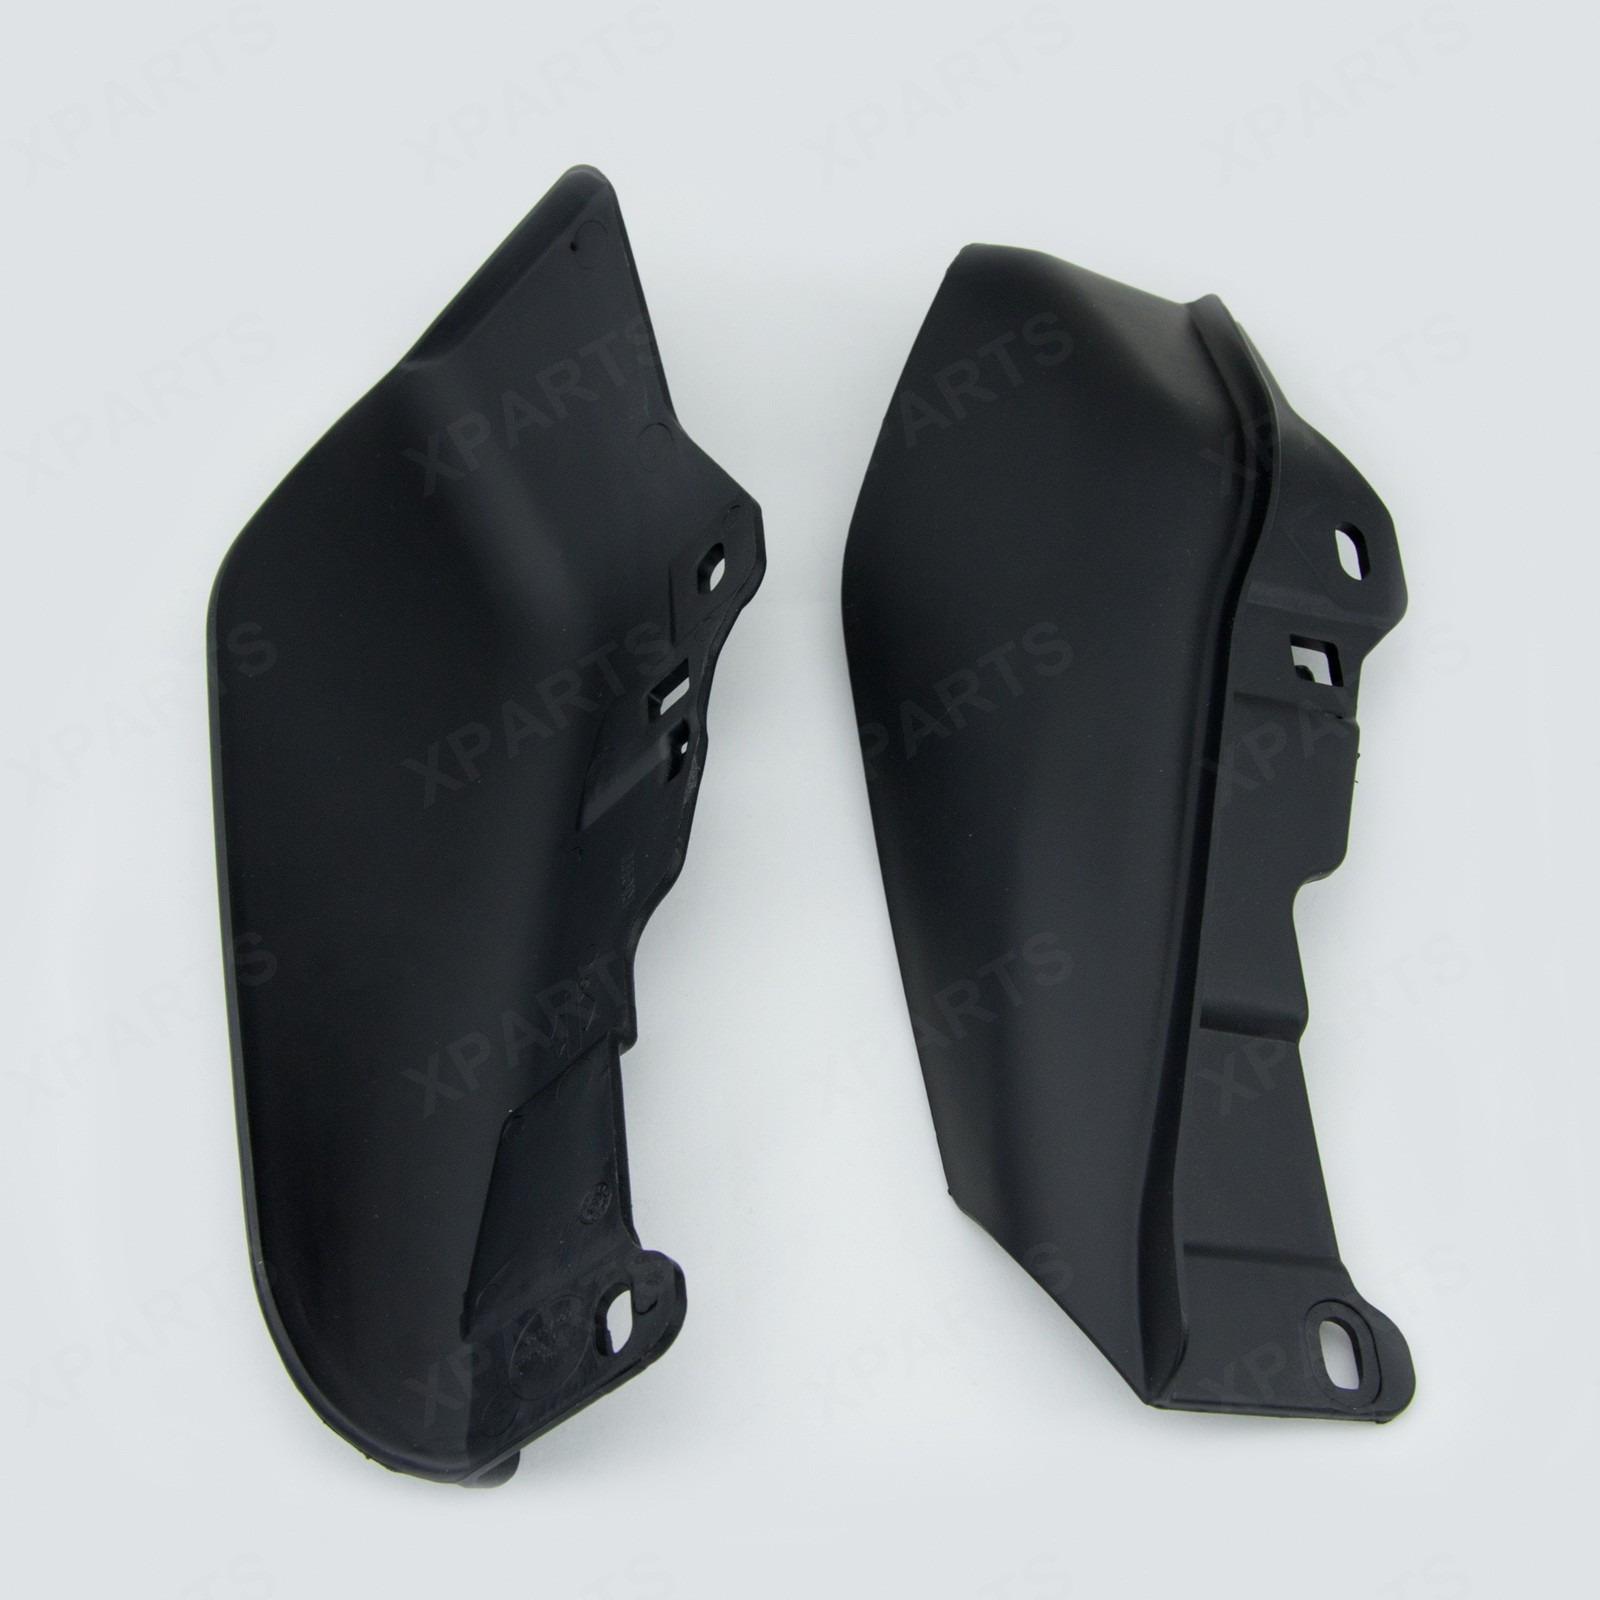 Pair Mid Frame Air Deflectors Trims For Harley Davidson